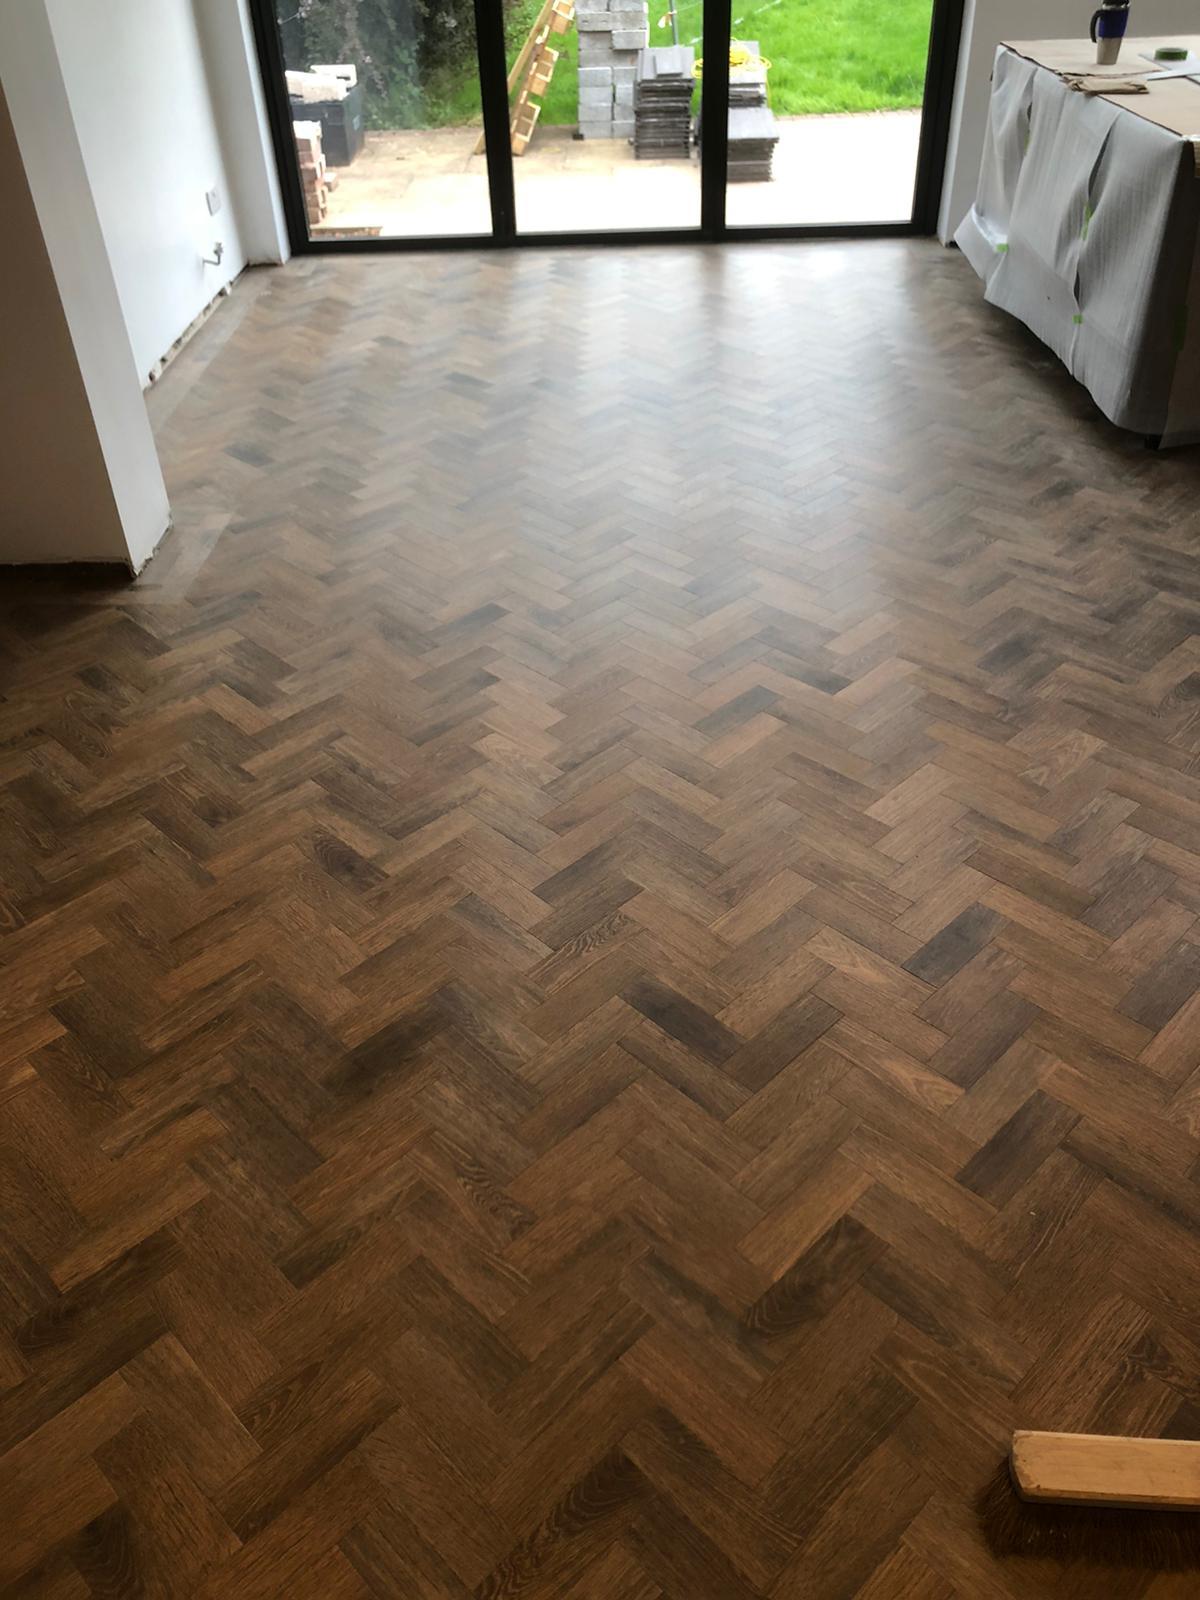 wooden tile flooring